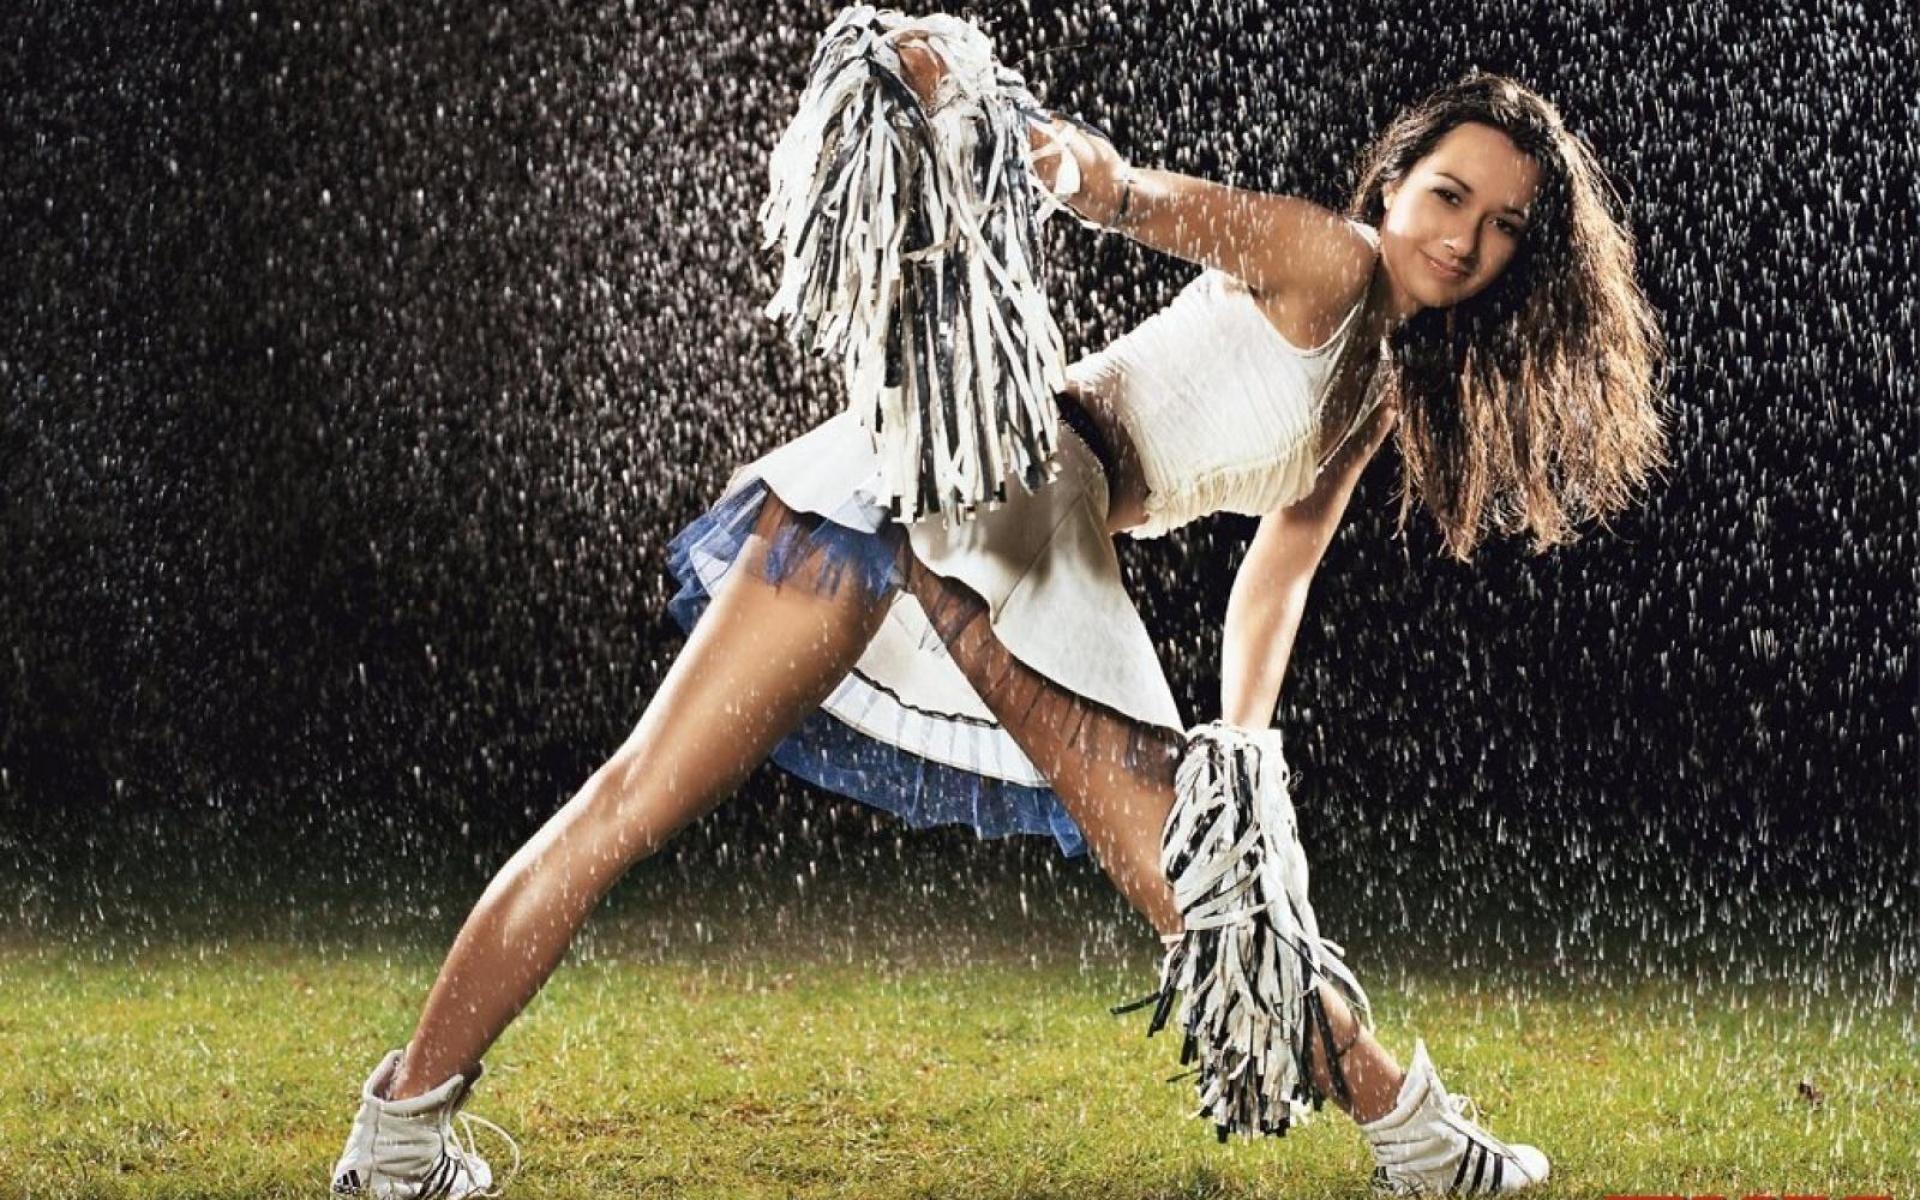 cheerleaders in the rain